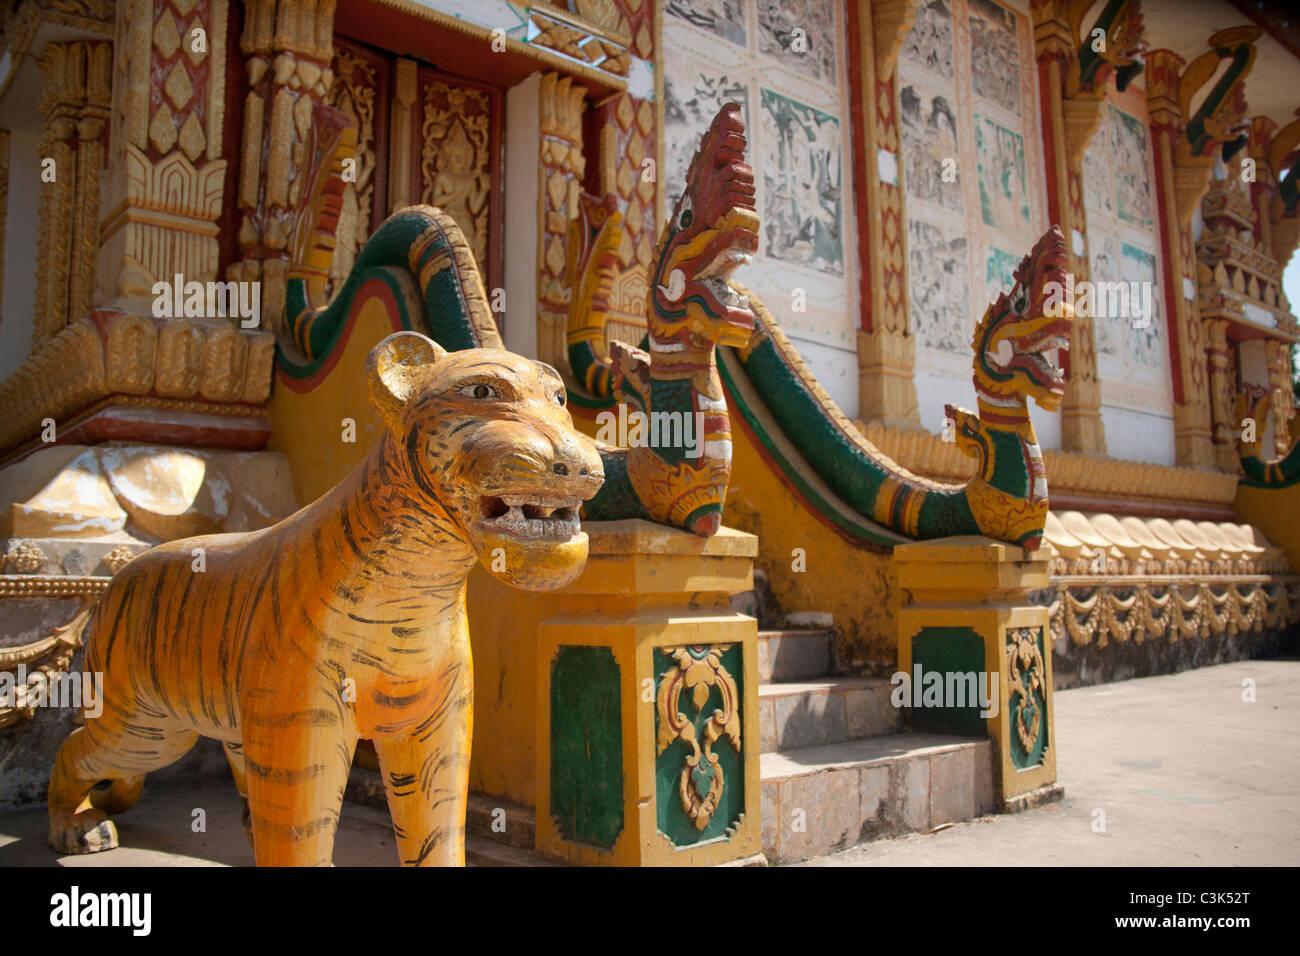 Ornate decorations adorn the entry way to Wat, Phonsavan, Xieng Khouang, Laos Stock Photo